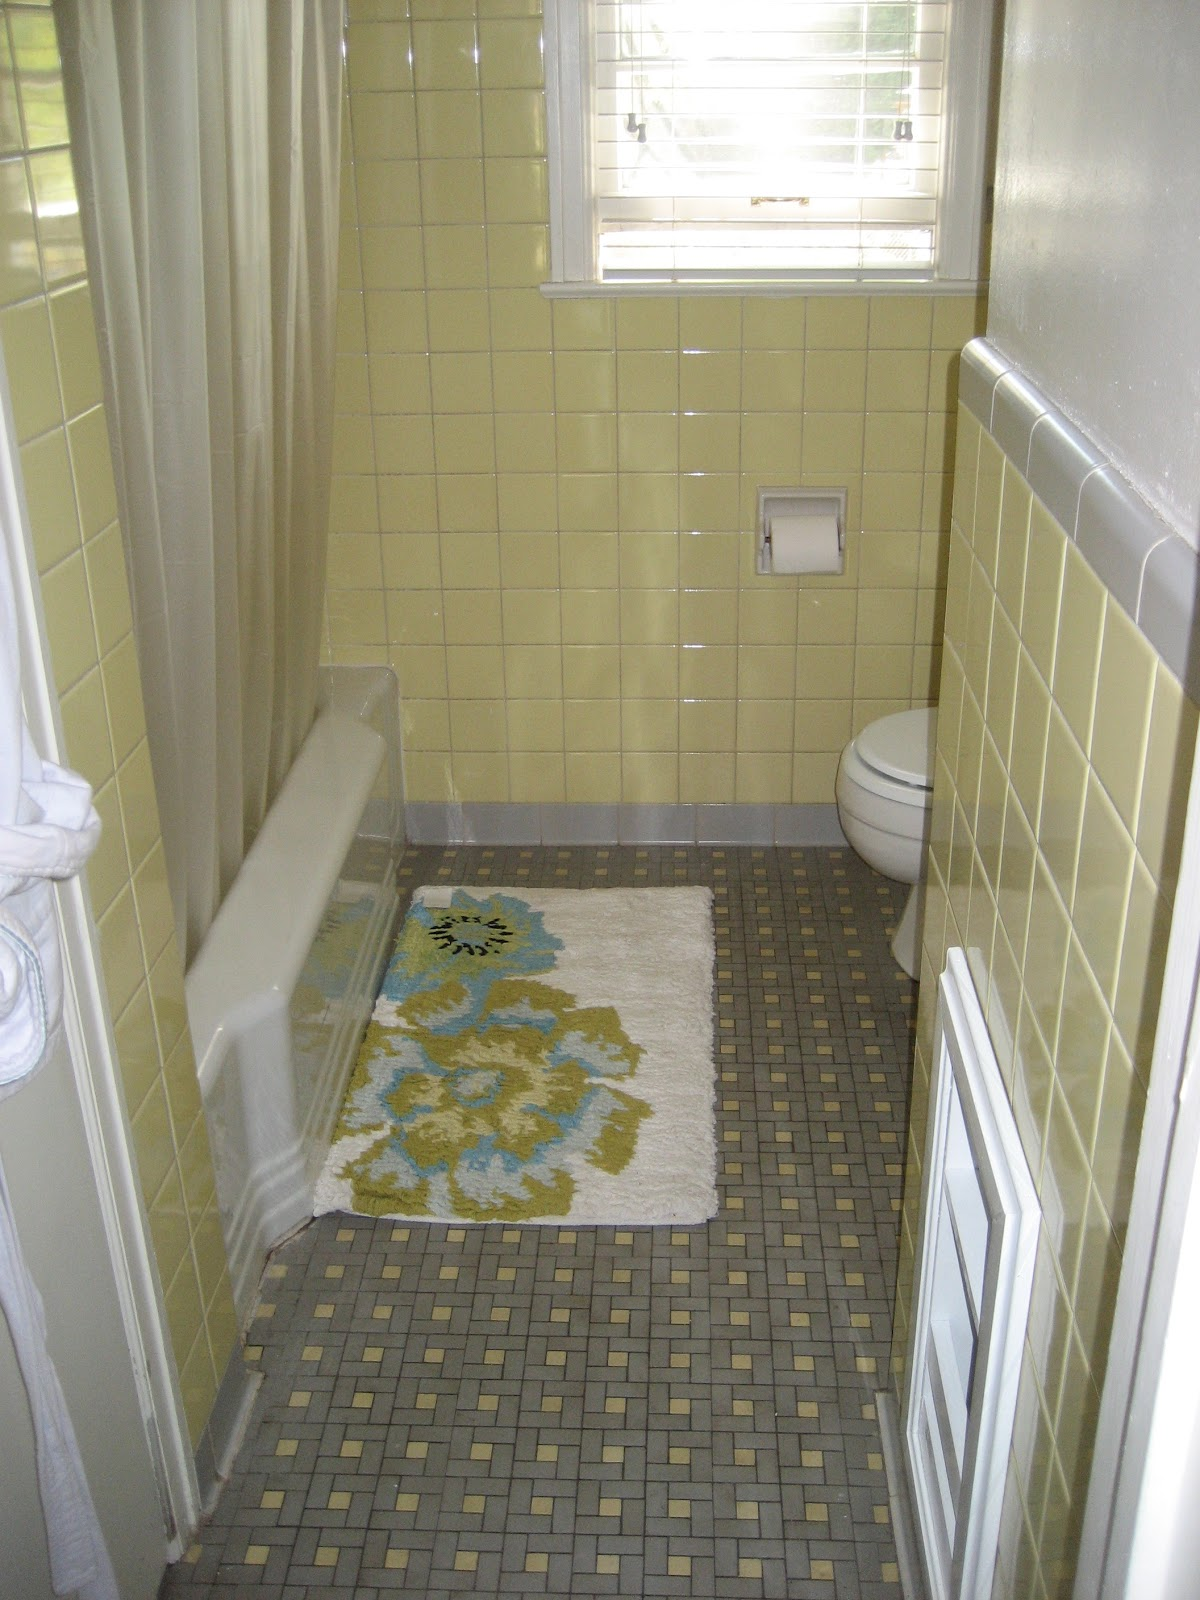 Yellow tile bathroom makeover - Yellow Tile Bathroom Makeover 22